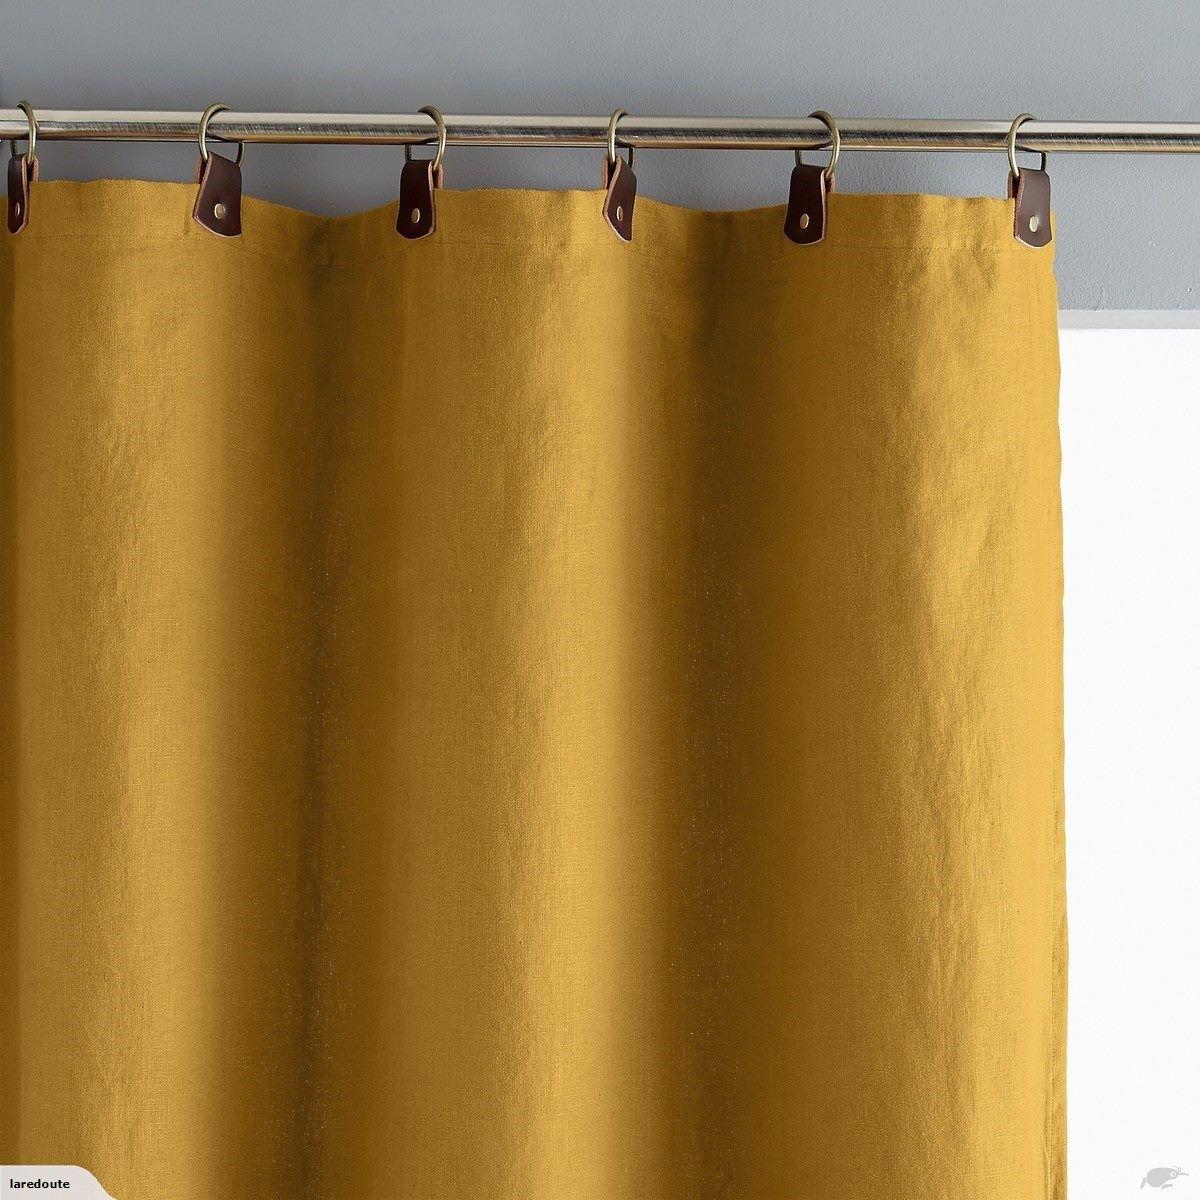 La Redoute Curtain Yellow Size 140 X 180 Cm